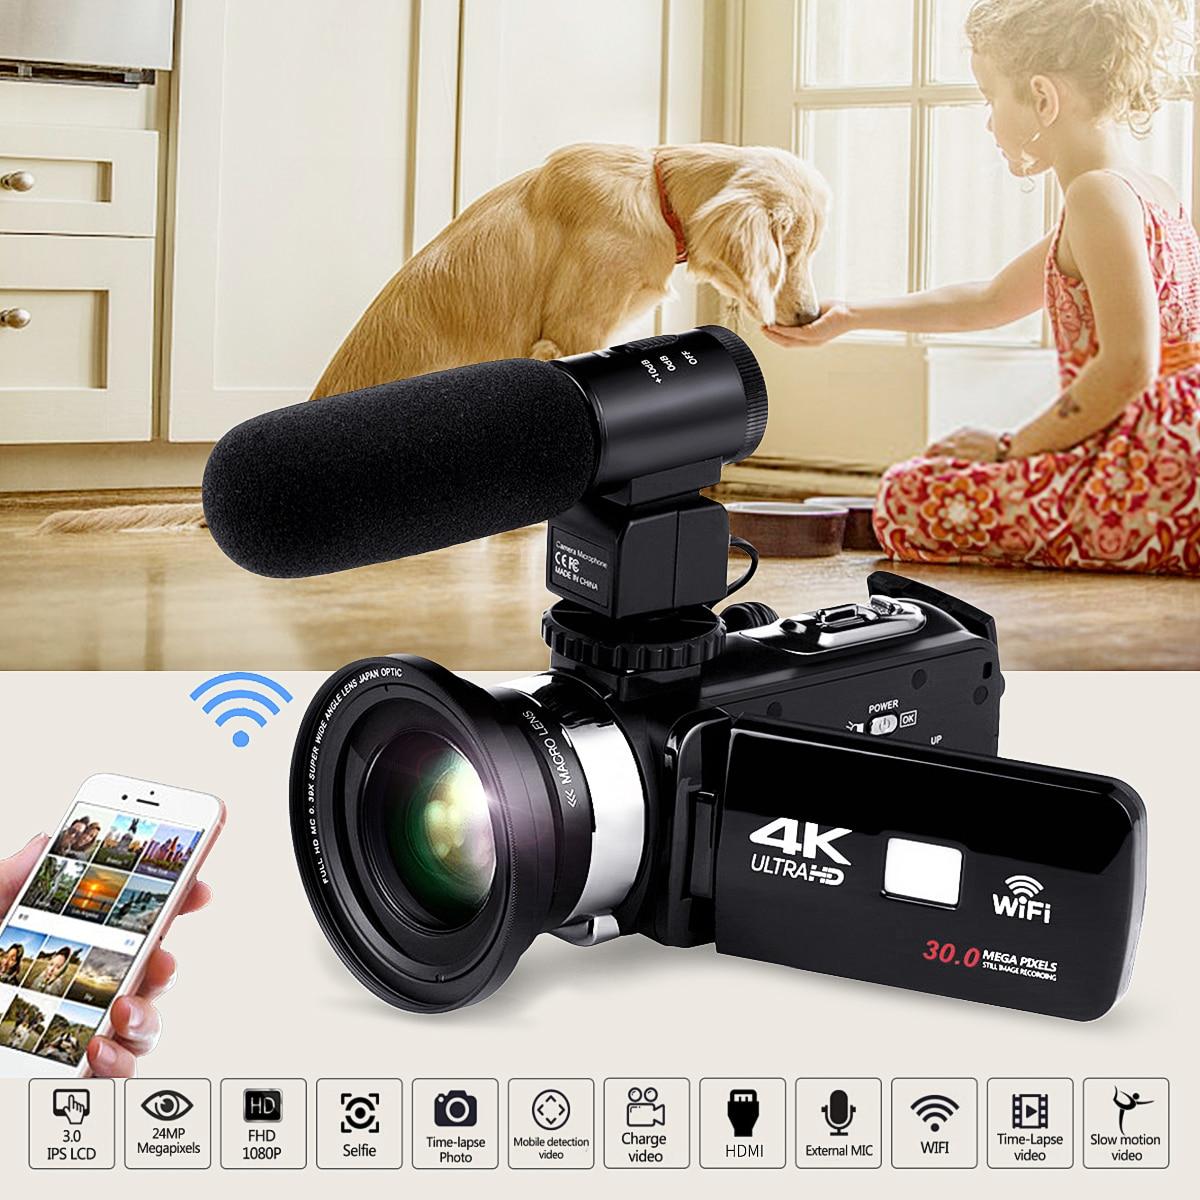 KINCO 1080P CMOS 4K WiFi Ultras HD 12 Million Pixel Sensor Digital Video Camera Camcorder DV Camcorder DV Lens Microphone